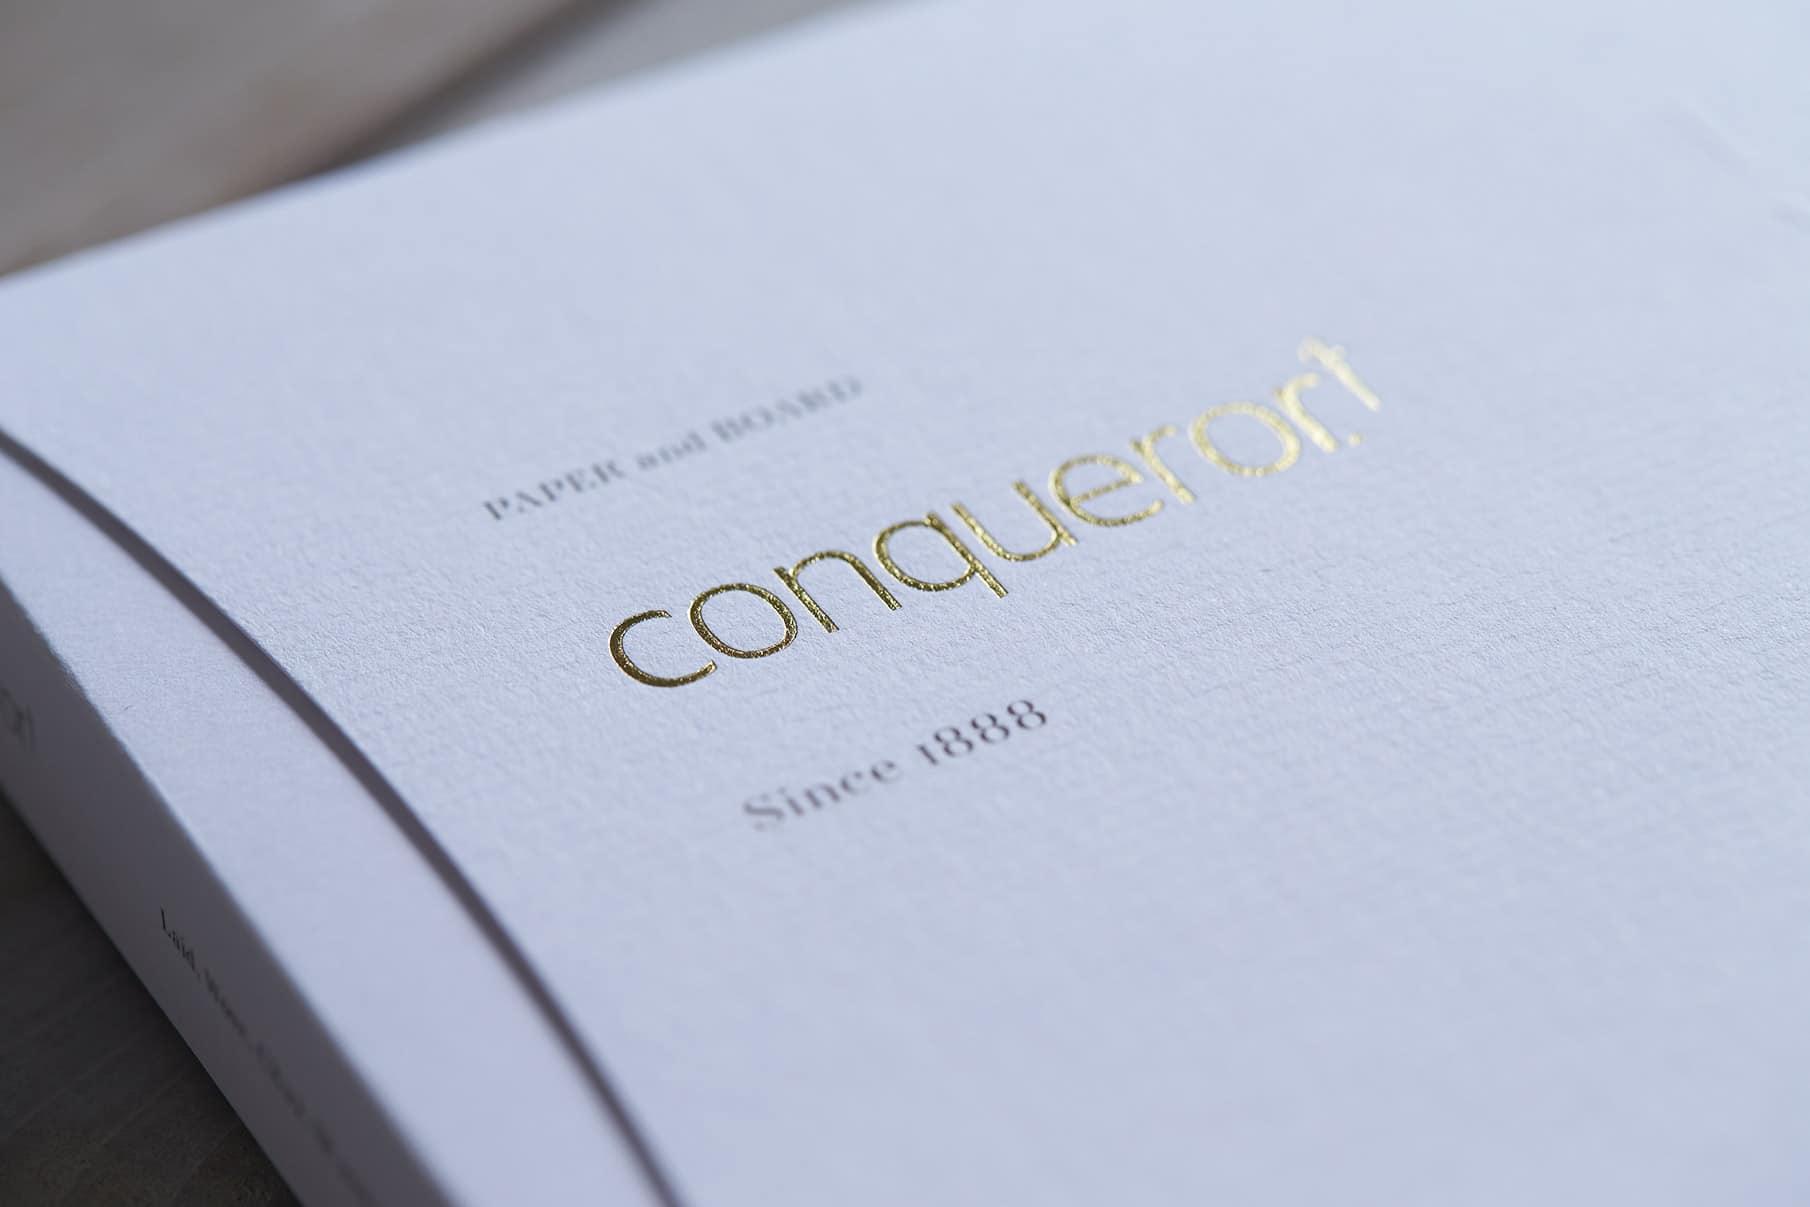 Conqueror - Promotion Box 2